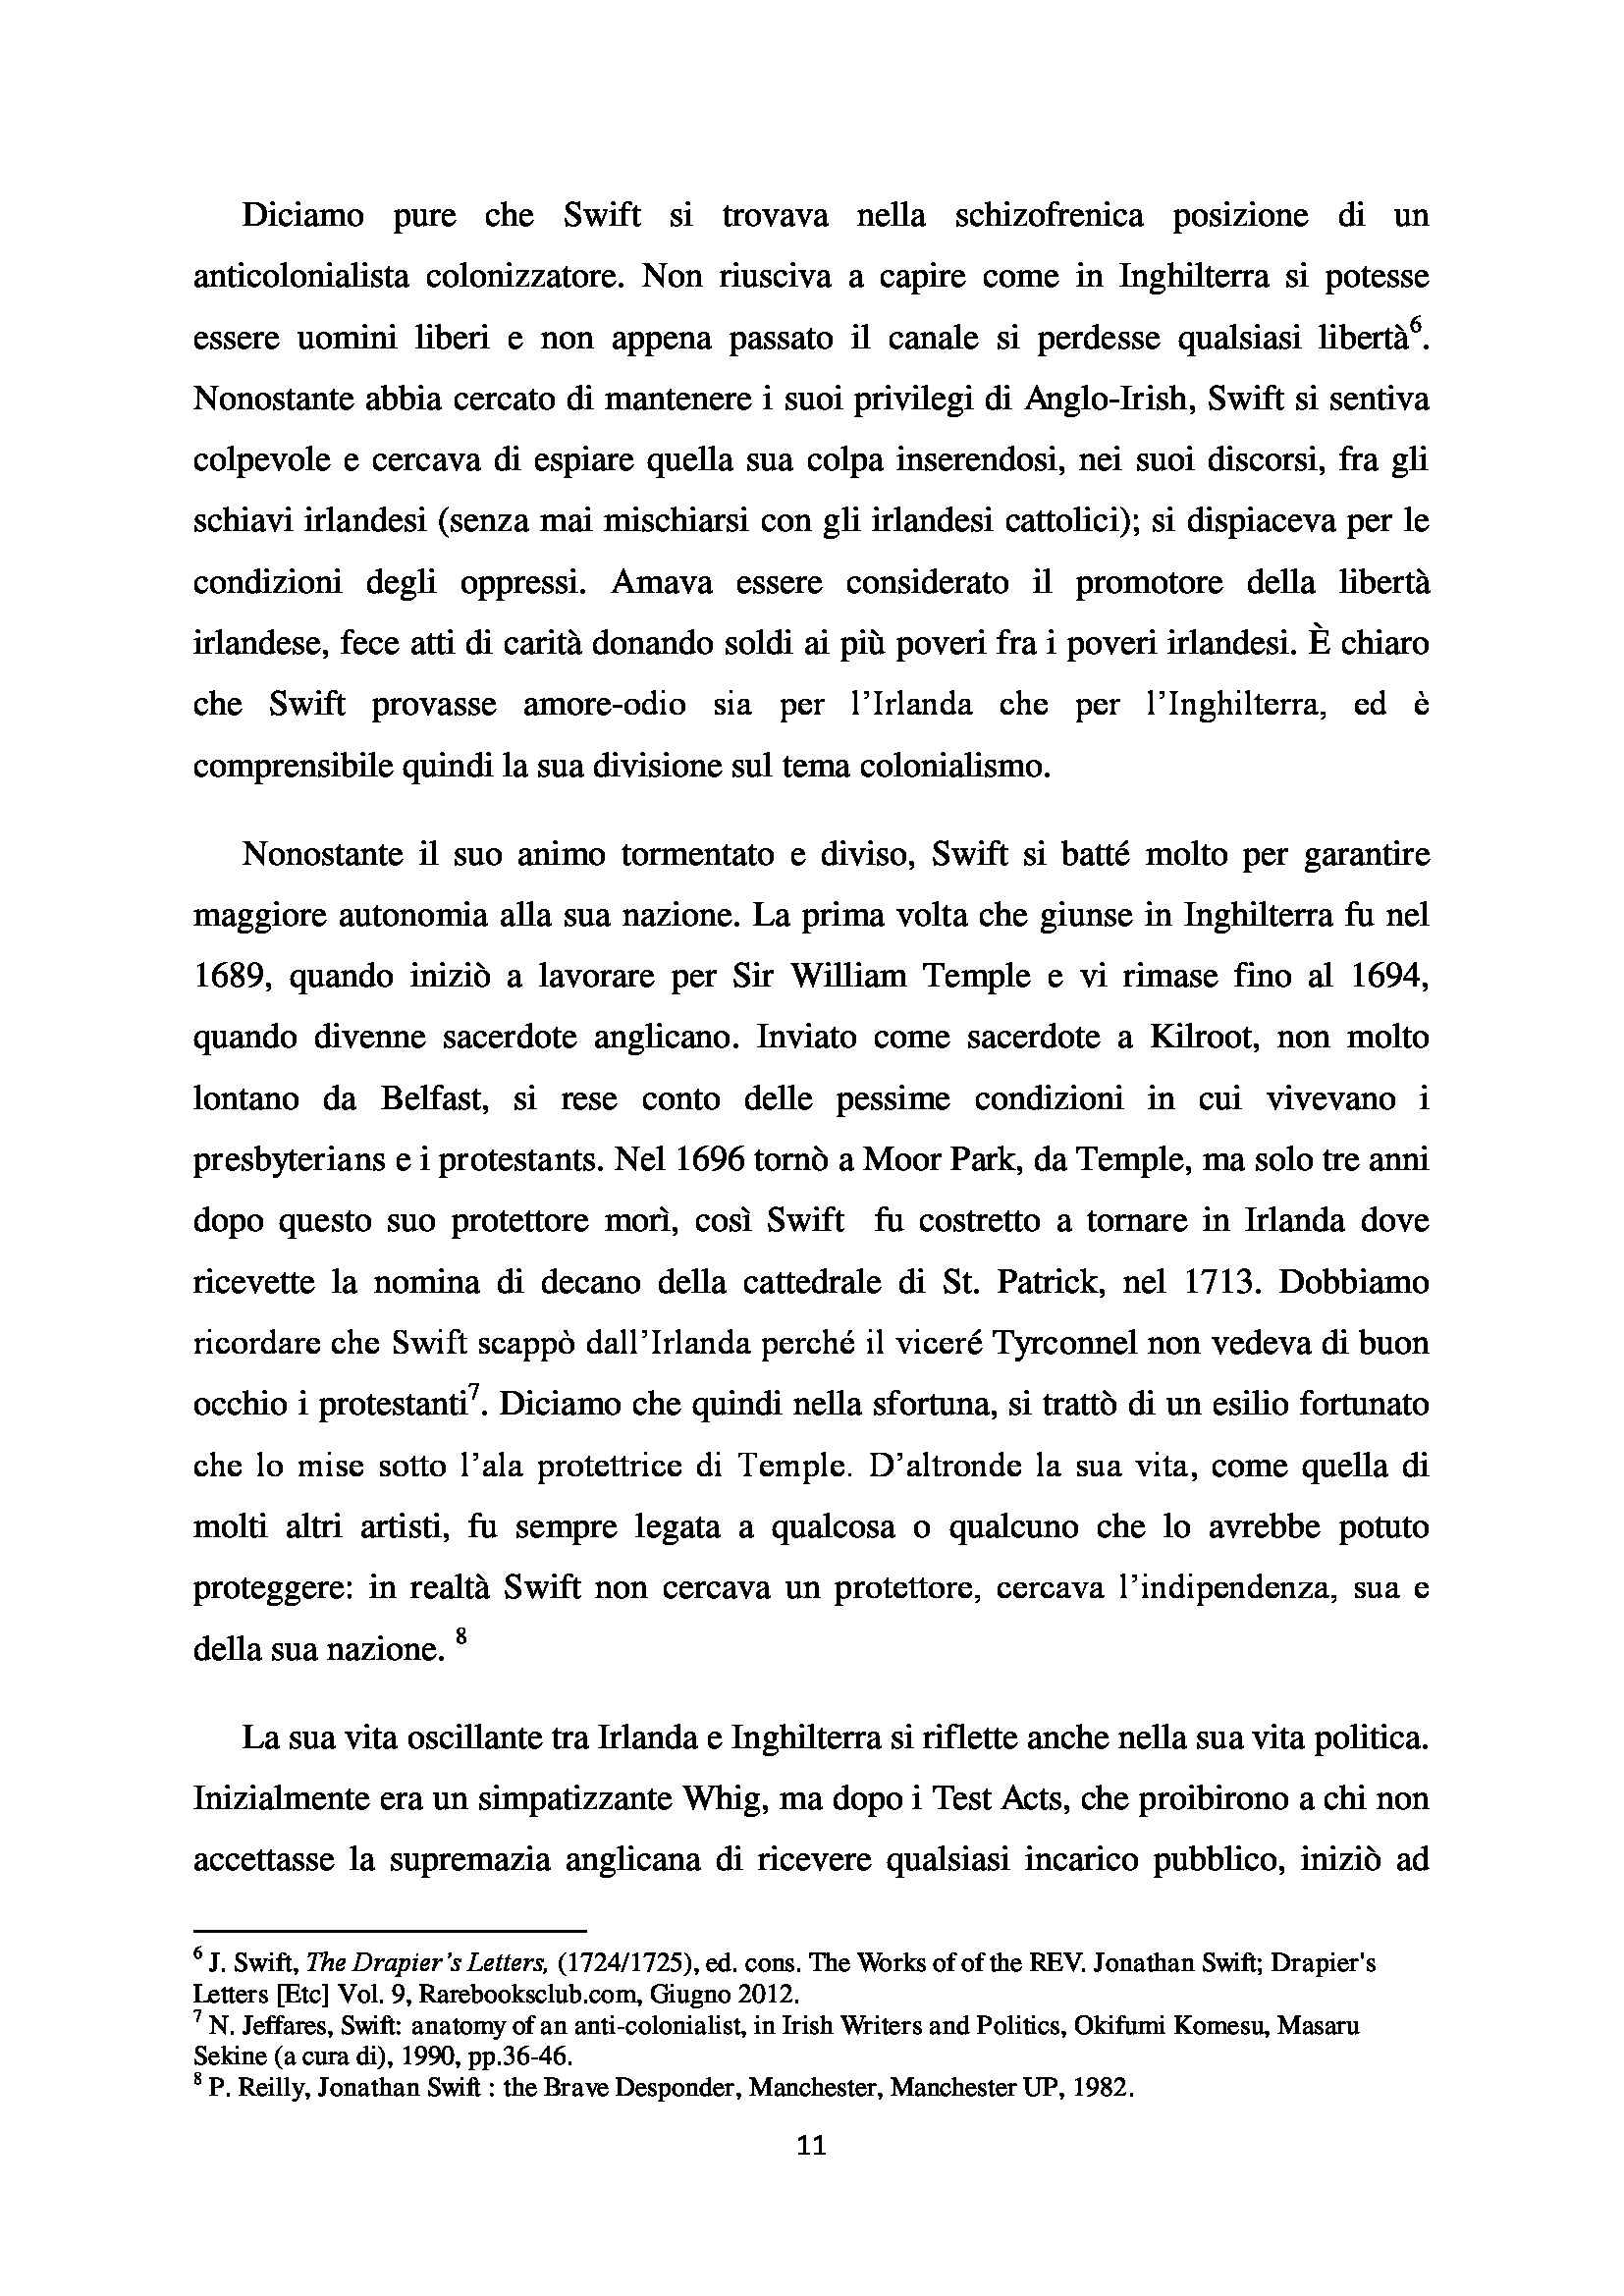 Tesi - A Modest Proposal Jonathan Swift Pag. 11